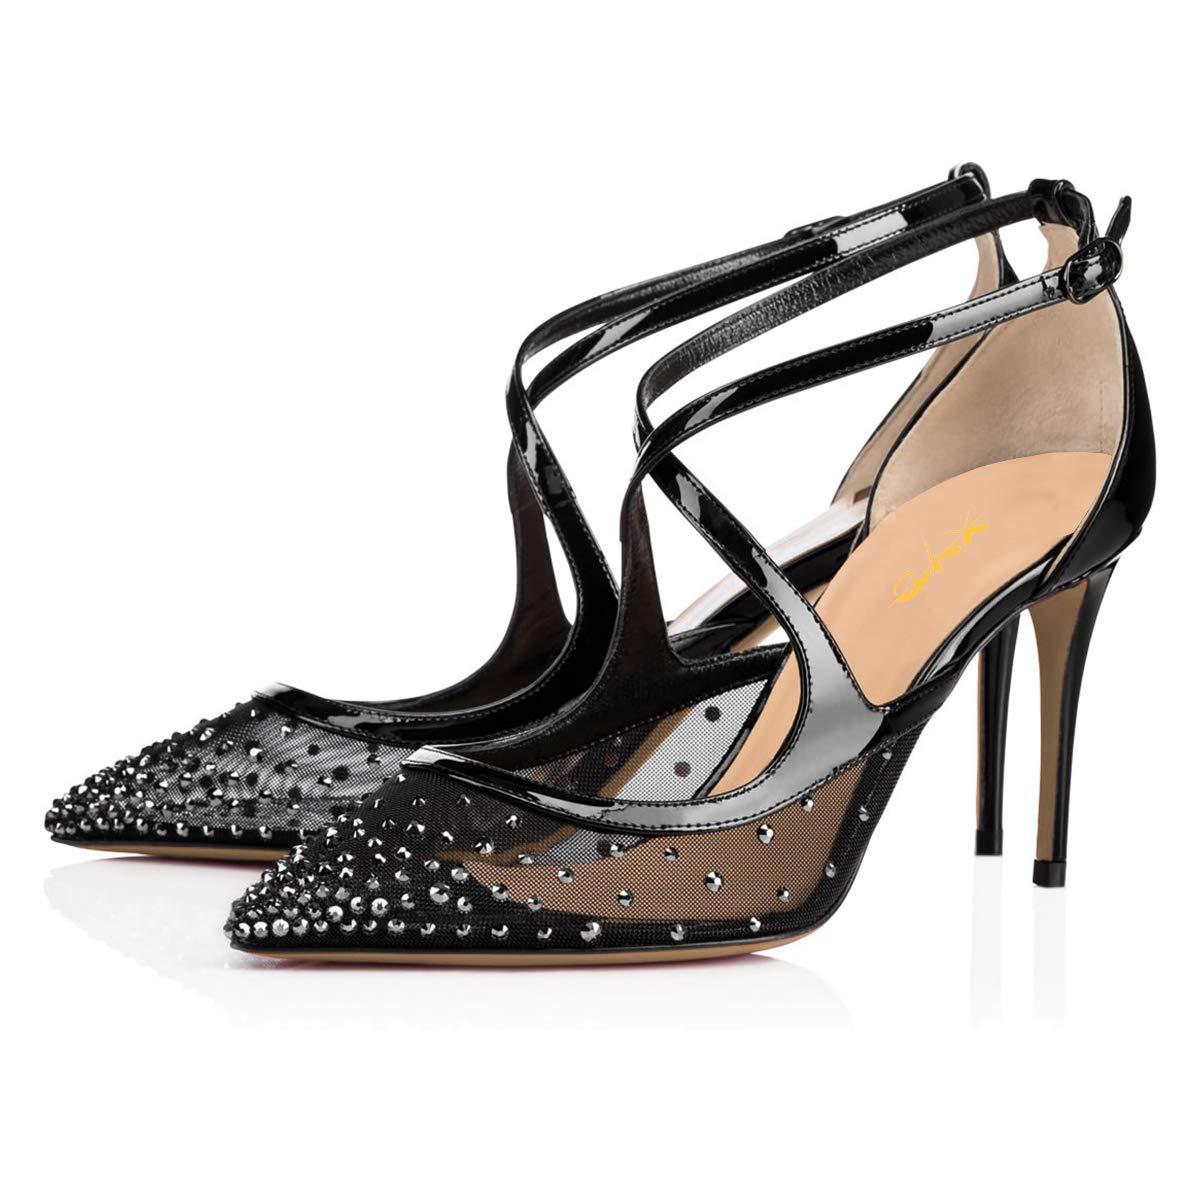 09c67061a1 Amazon.com   XYD Women Stylish Crisscross Strap High Heel Pumps ...